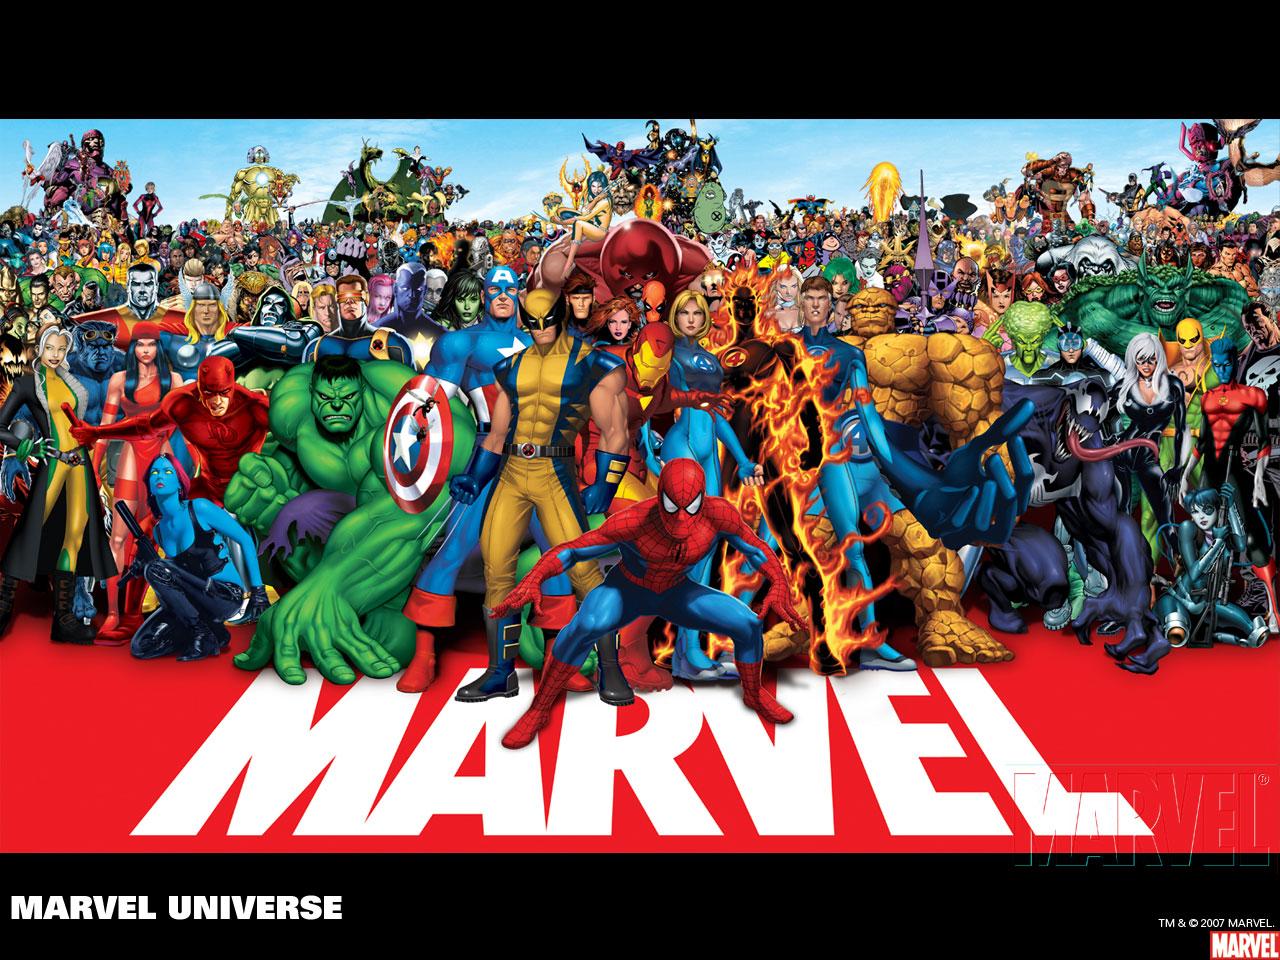 http://3.bp.blogspot.com/-QRsXp03Xmyo/T6qH7rXeqiI/AAAAAAAABsI/rxi2THqkXIU/s1600/Marvel-Universe-Team.jpg